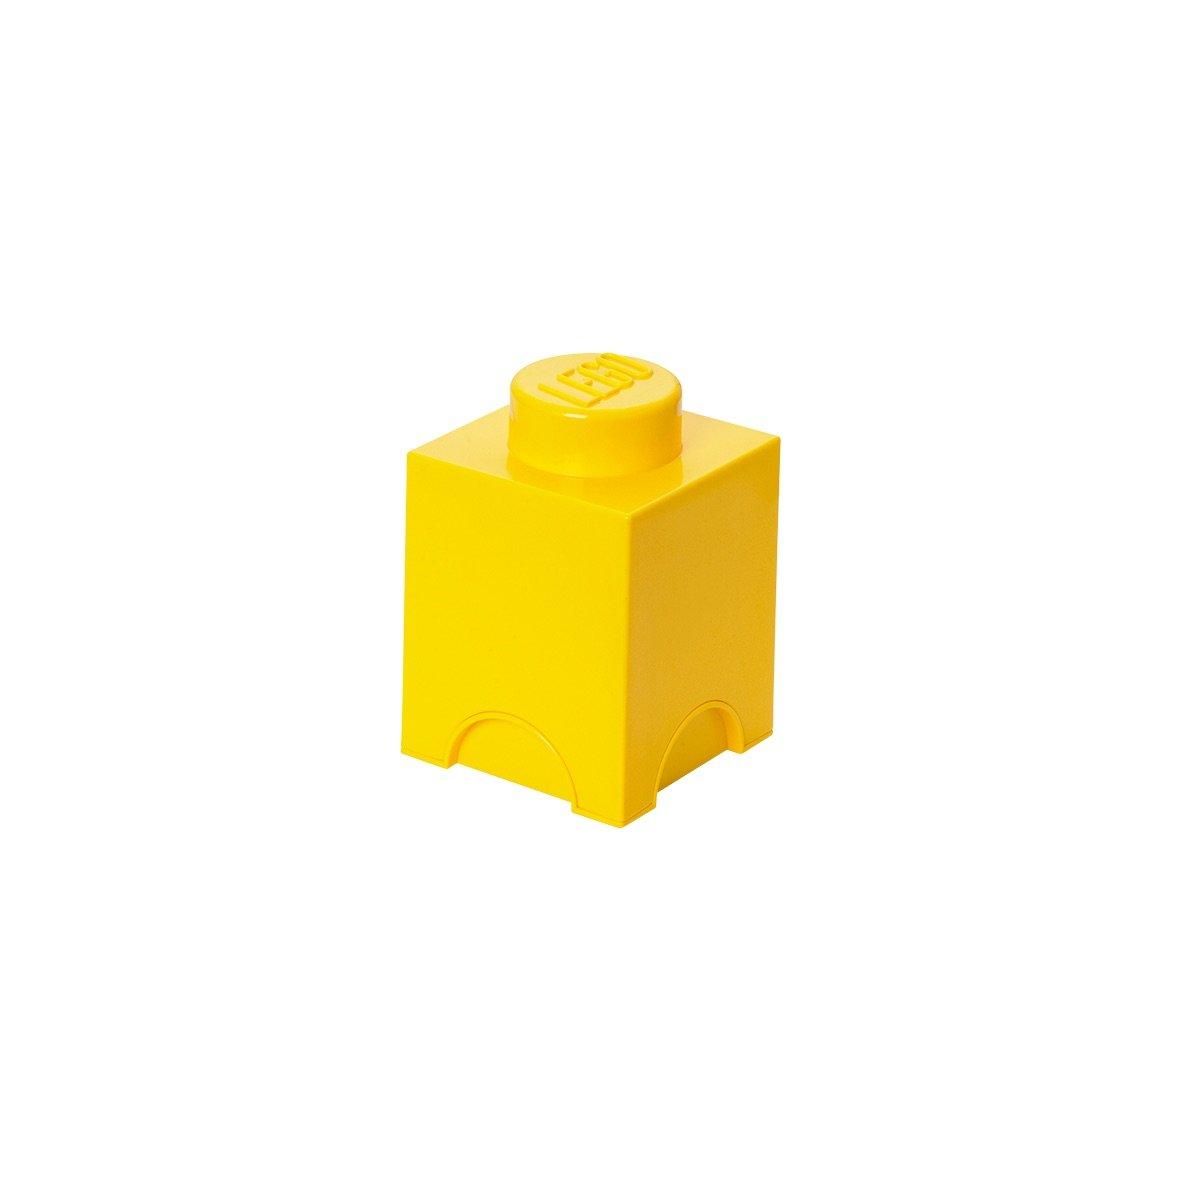 Pantone Universe Lego Storage Brick 1, Yellow